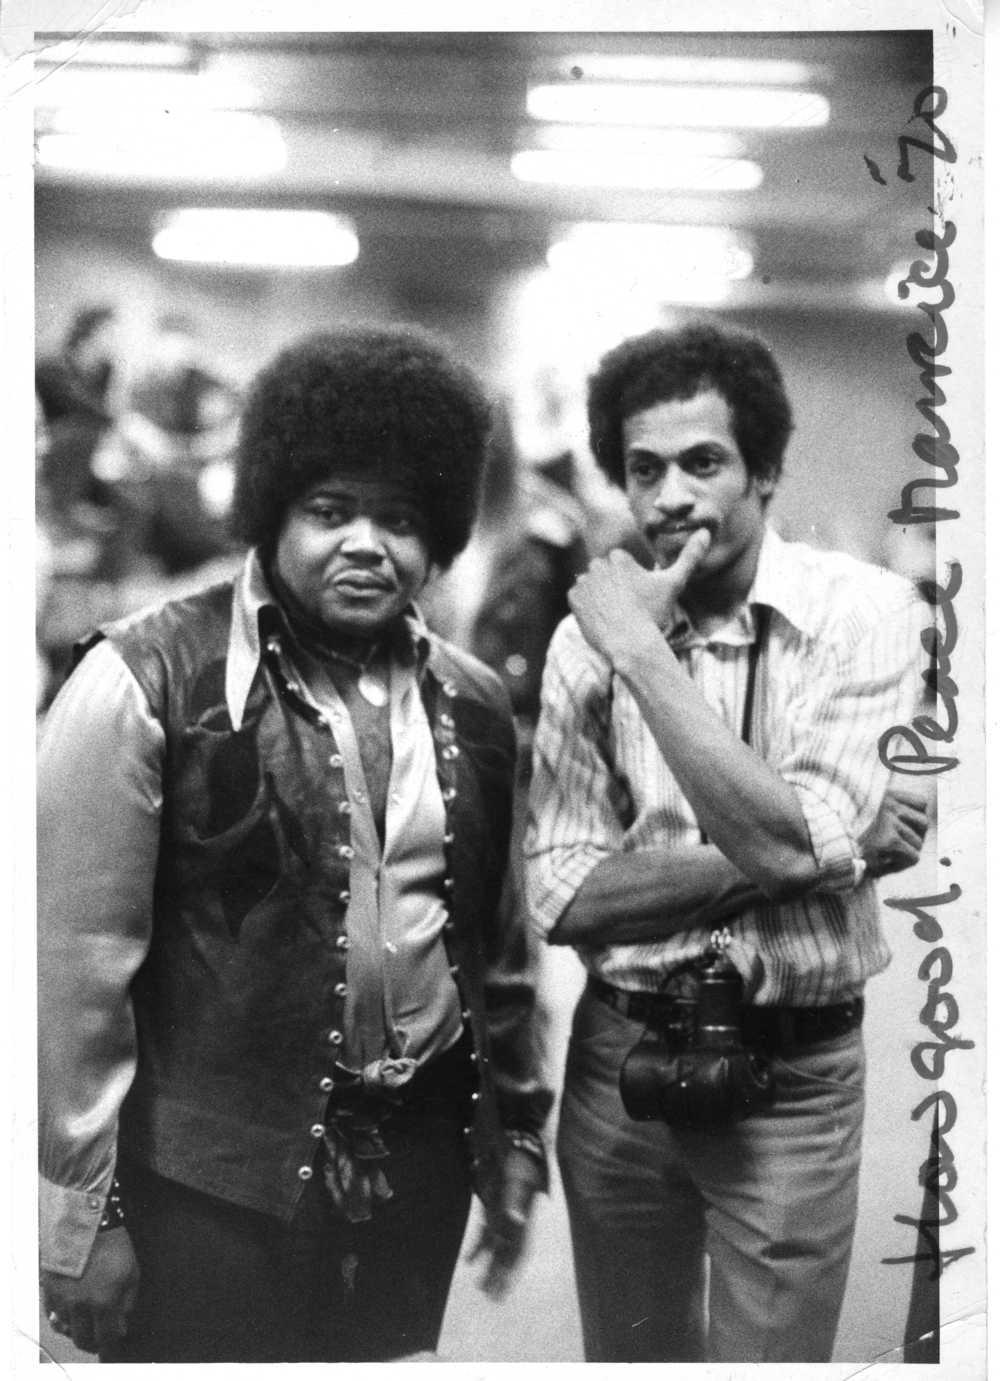 Jim Cummins & Buddy Miles behind stage at MSG Hendrix Concert copy.jpg